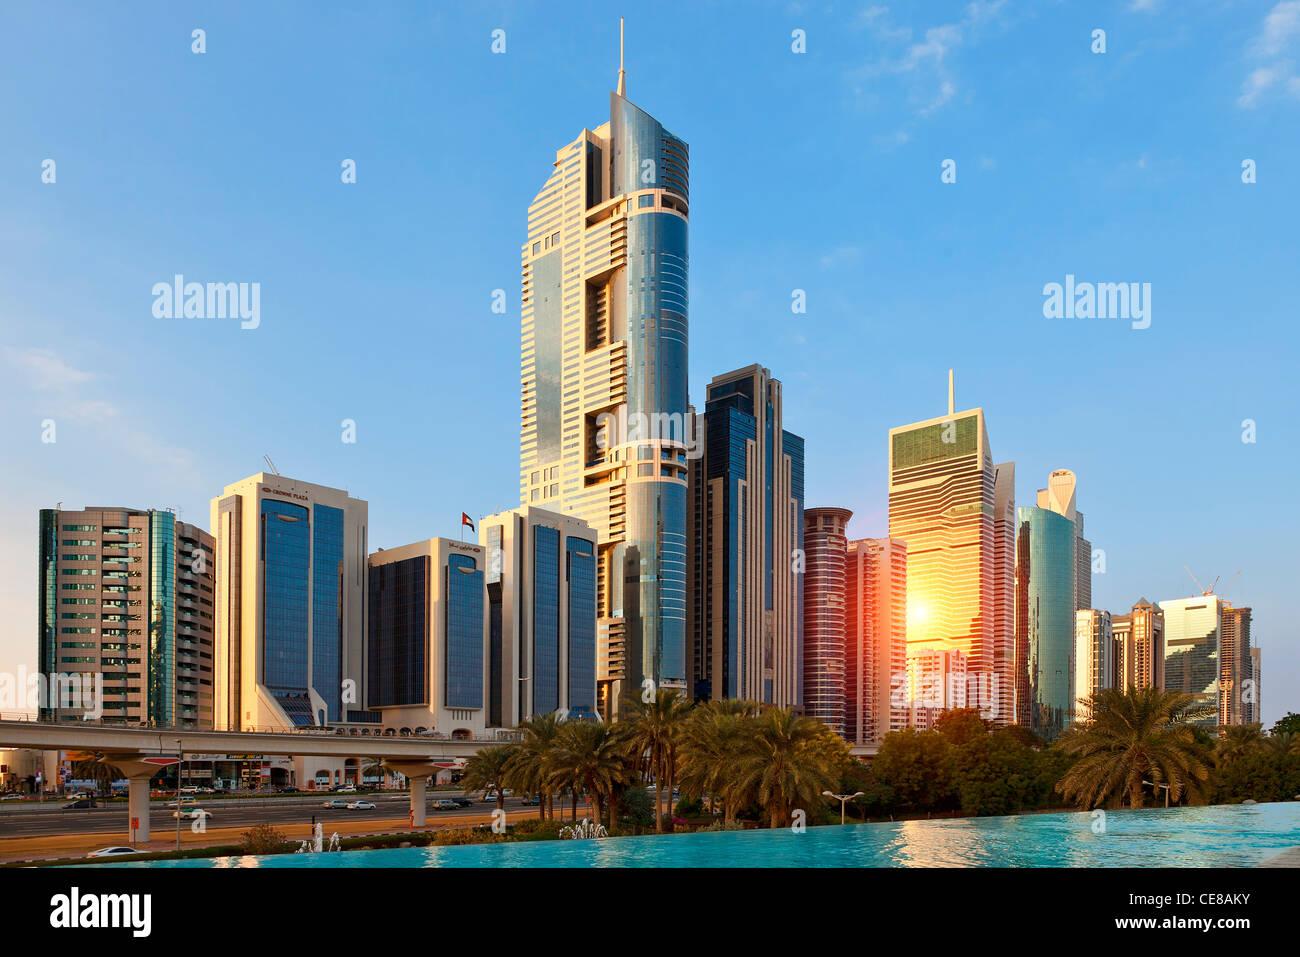 Dubai, Skyscrapers along Sheikh Zayed Road - Stock Image